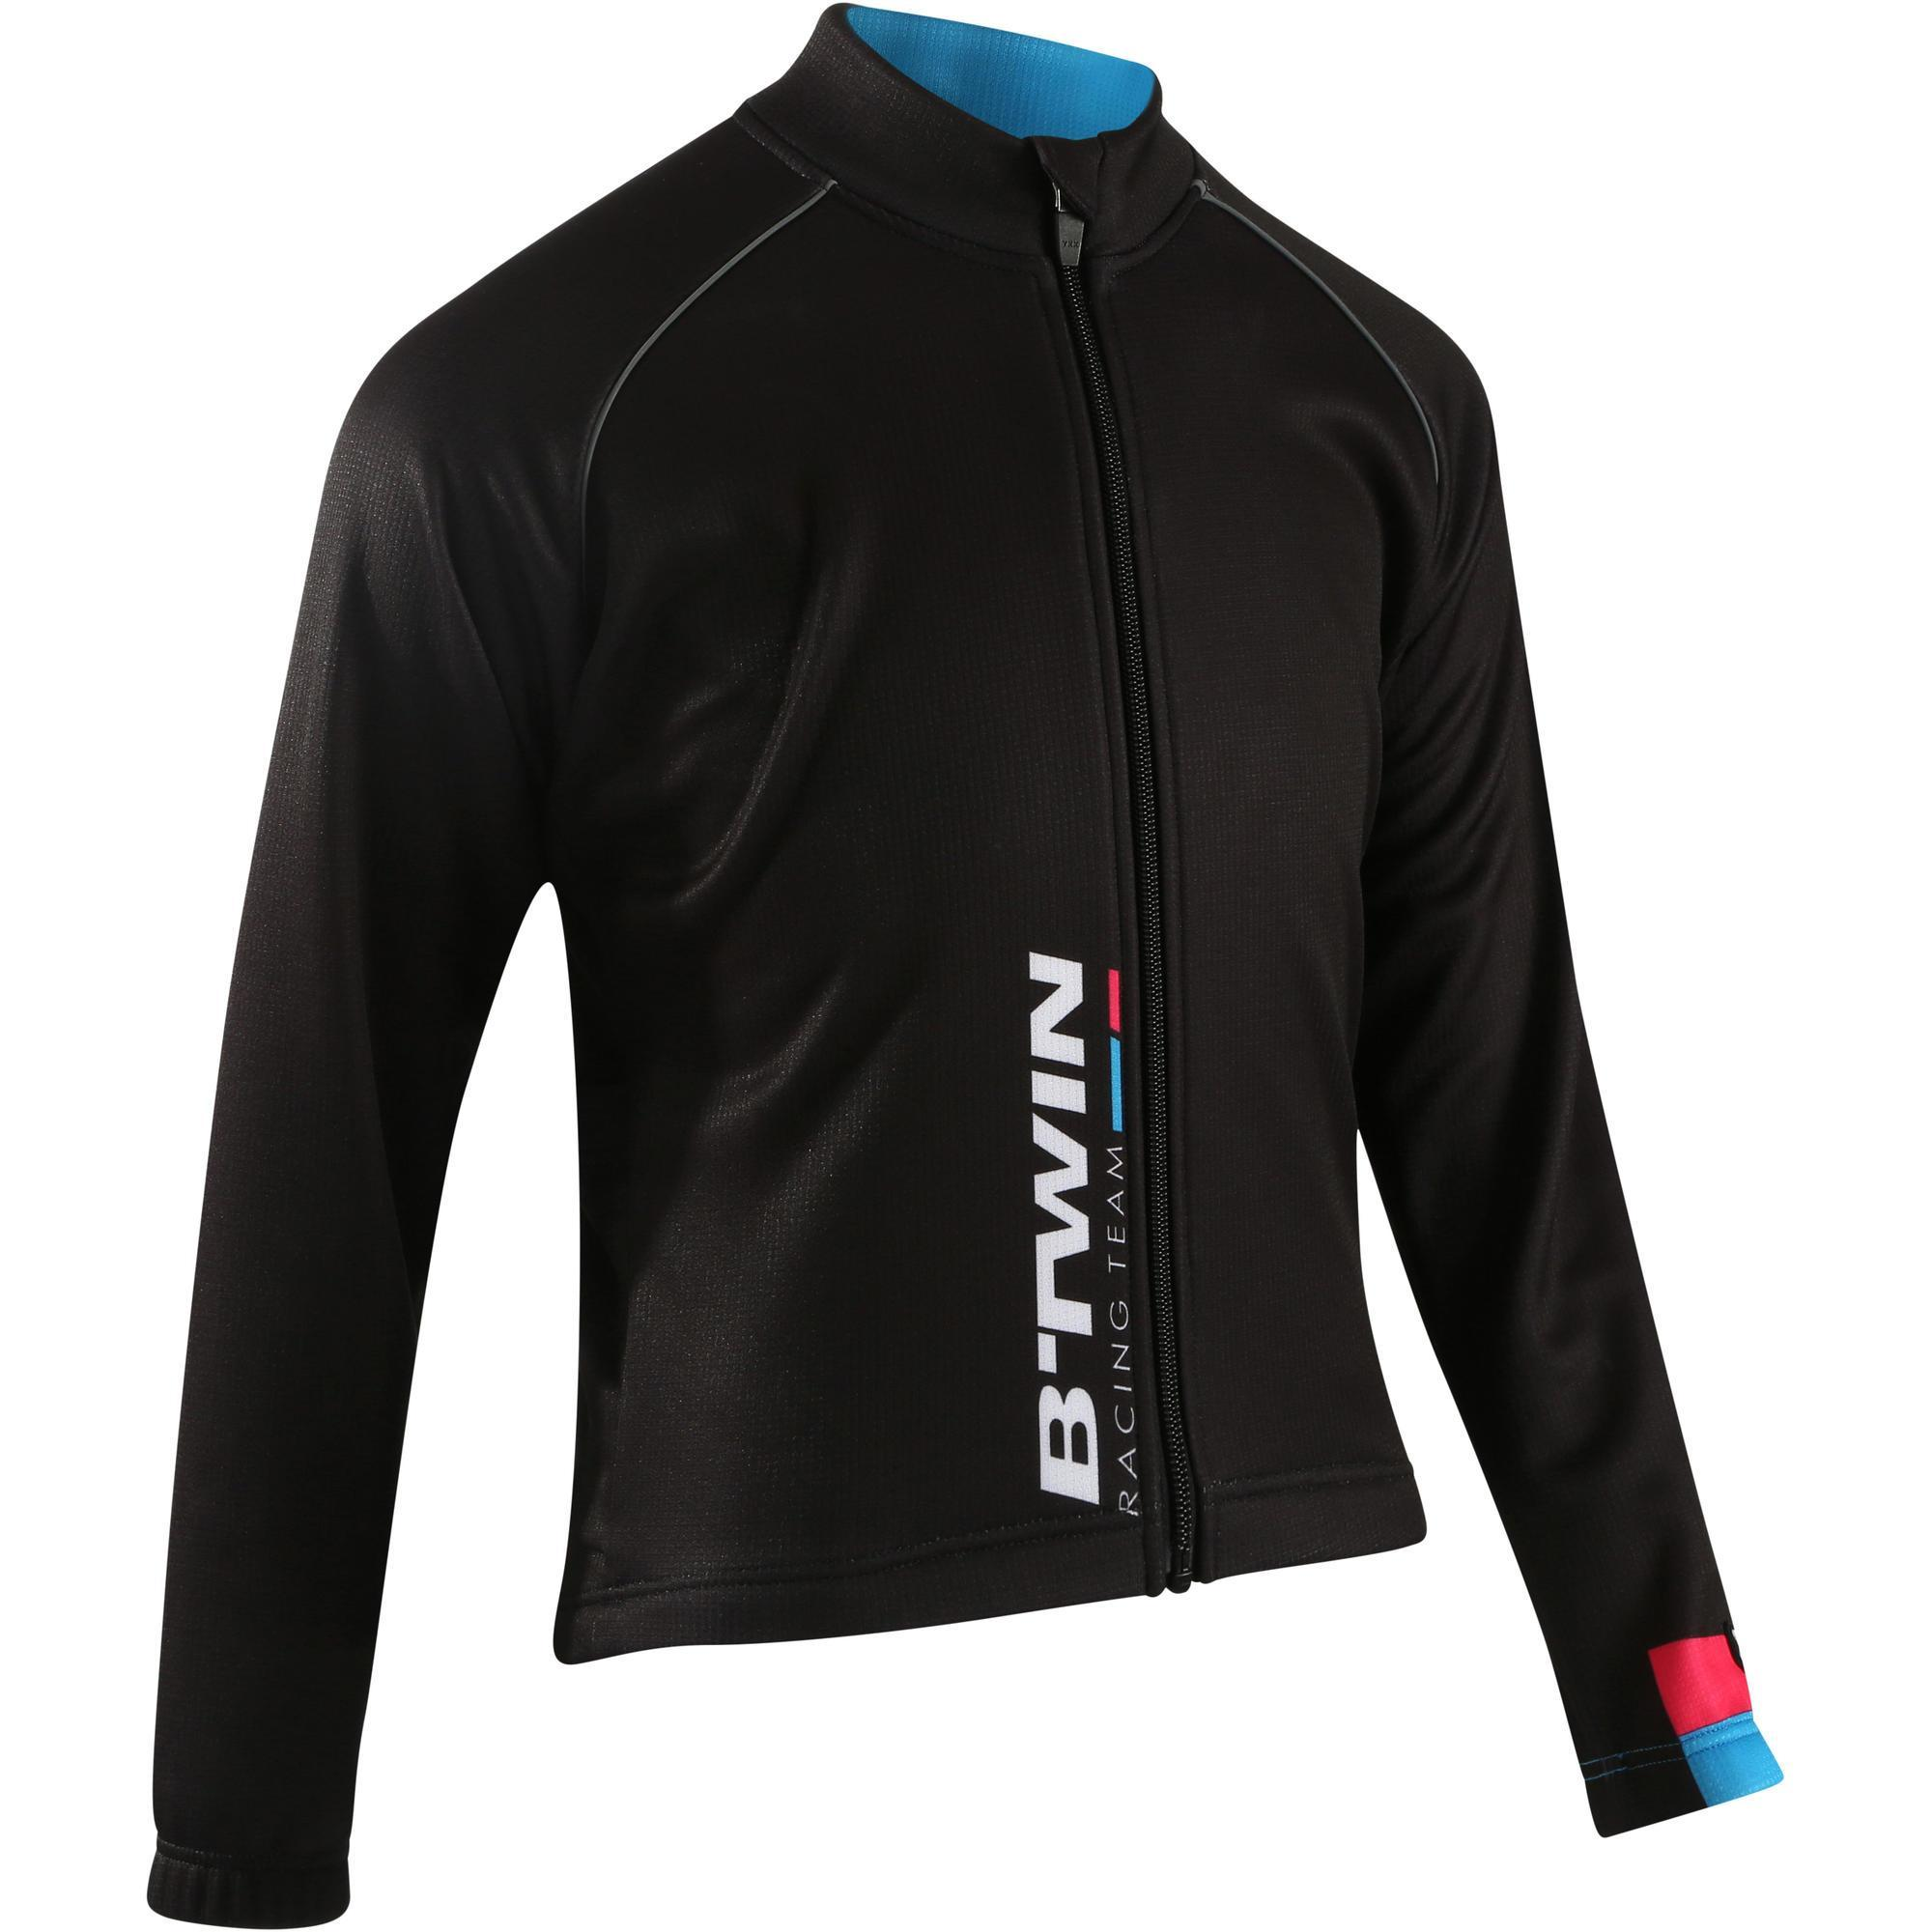 Fahrradjacke 500 Kinder schwarz | Sportbekleidung > Sportjacken > Fahrradjacken | B´twin